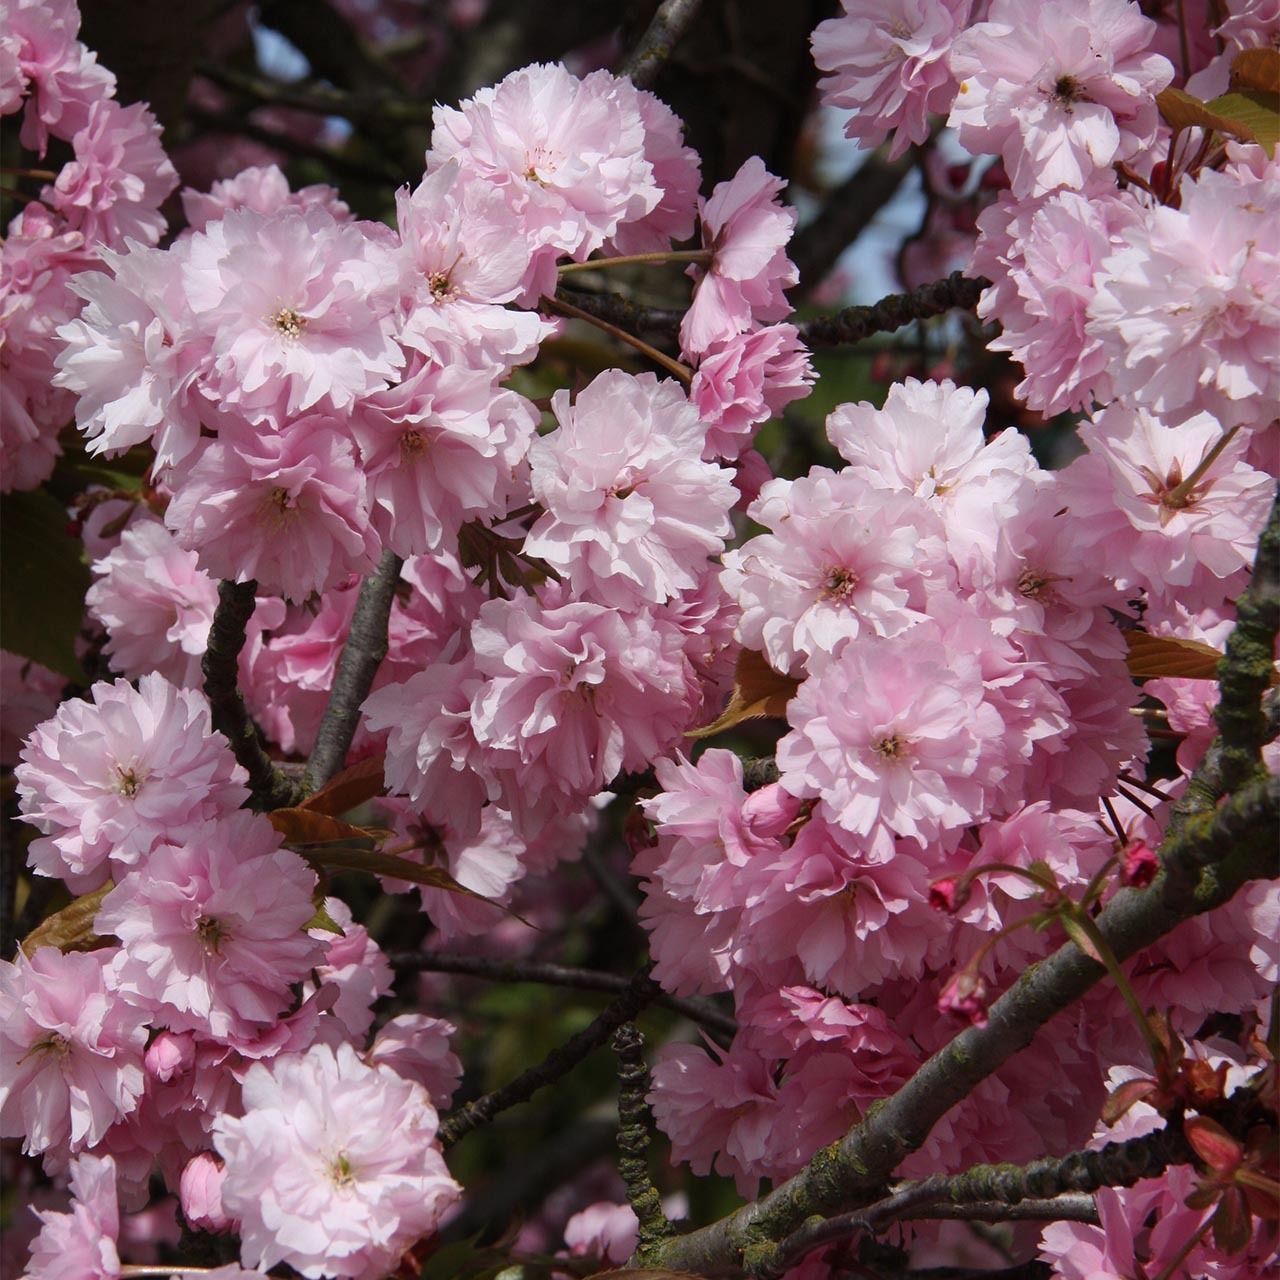 Prunus Kanzan Ornamental Cher Dobbies Ornamental Cherry Spring Flowering Trees Flowering Trees